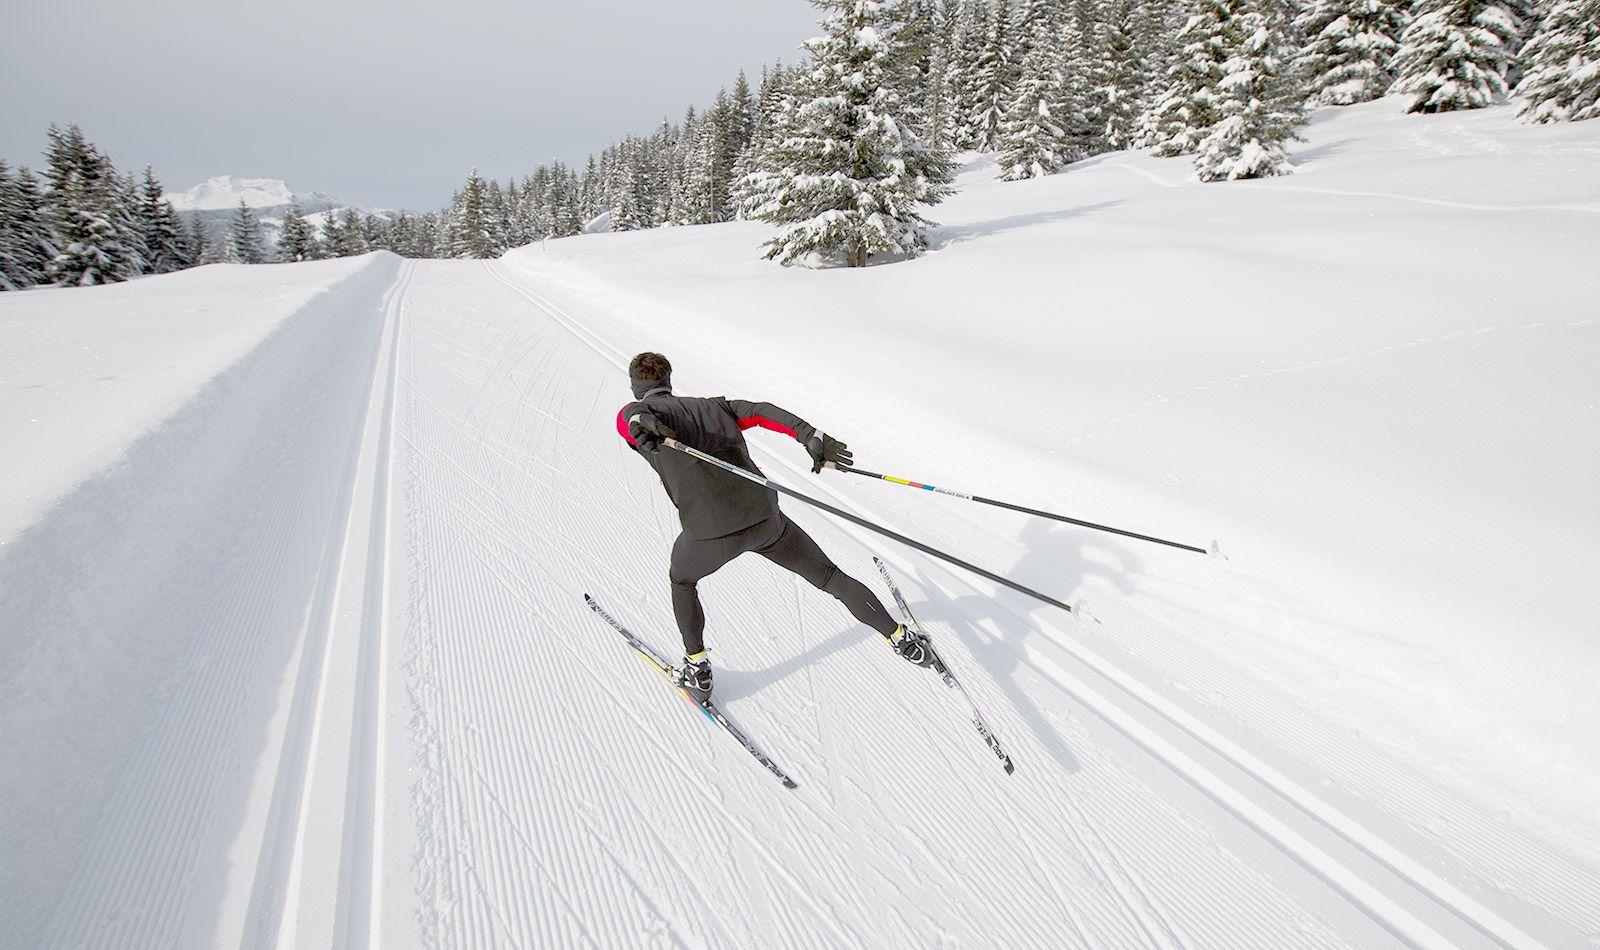 Equipe 8 Vitane Skate Skating Skis Nordic Skiing Salomon Usa Nordic Skiing Cross Country Skiing Skiing